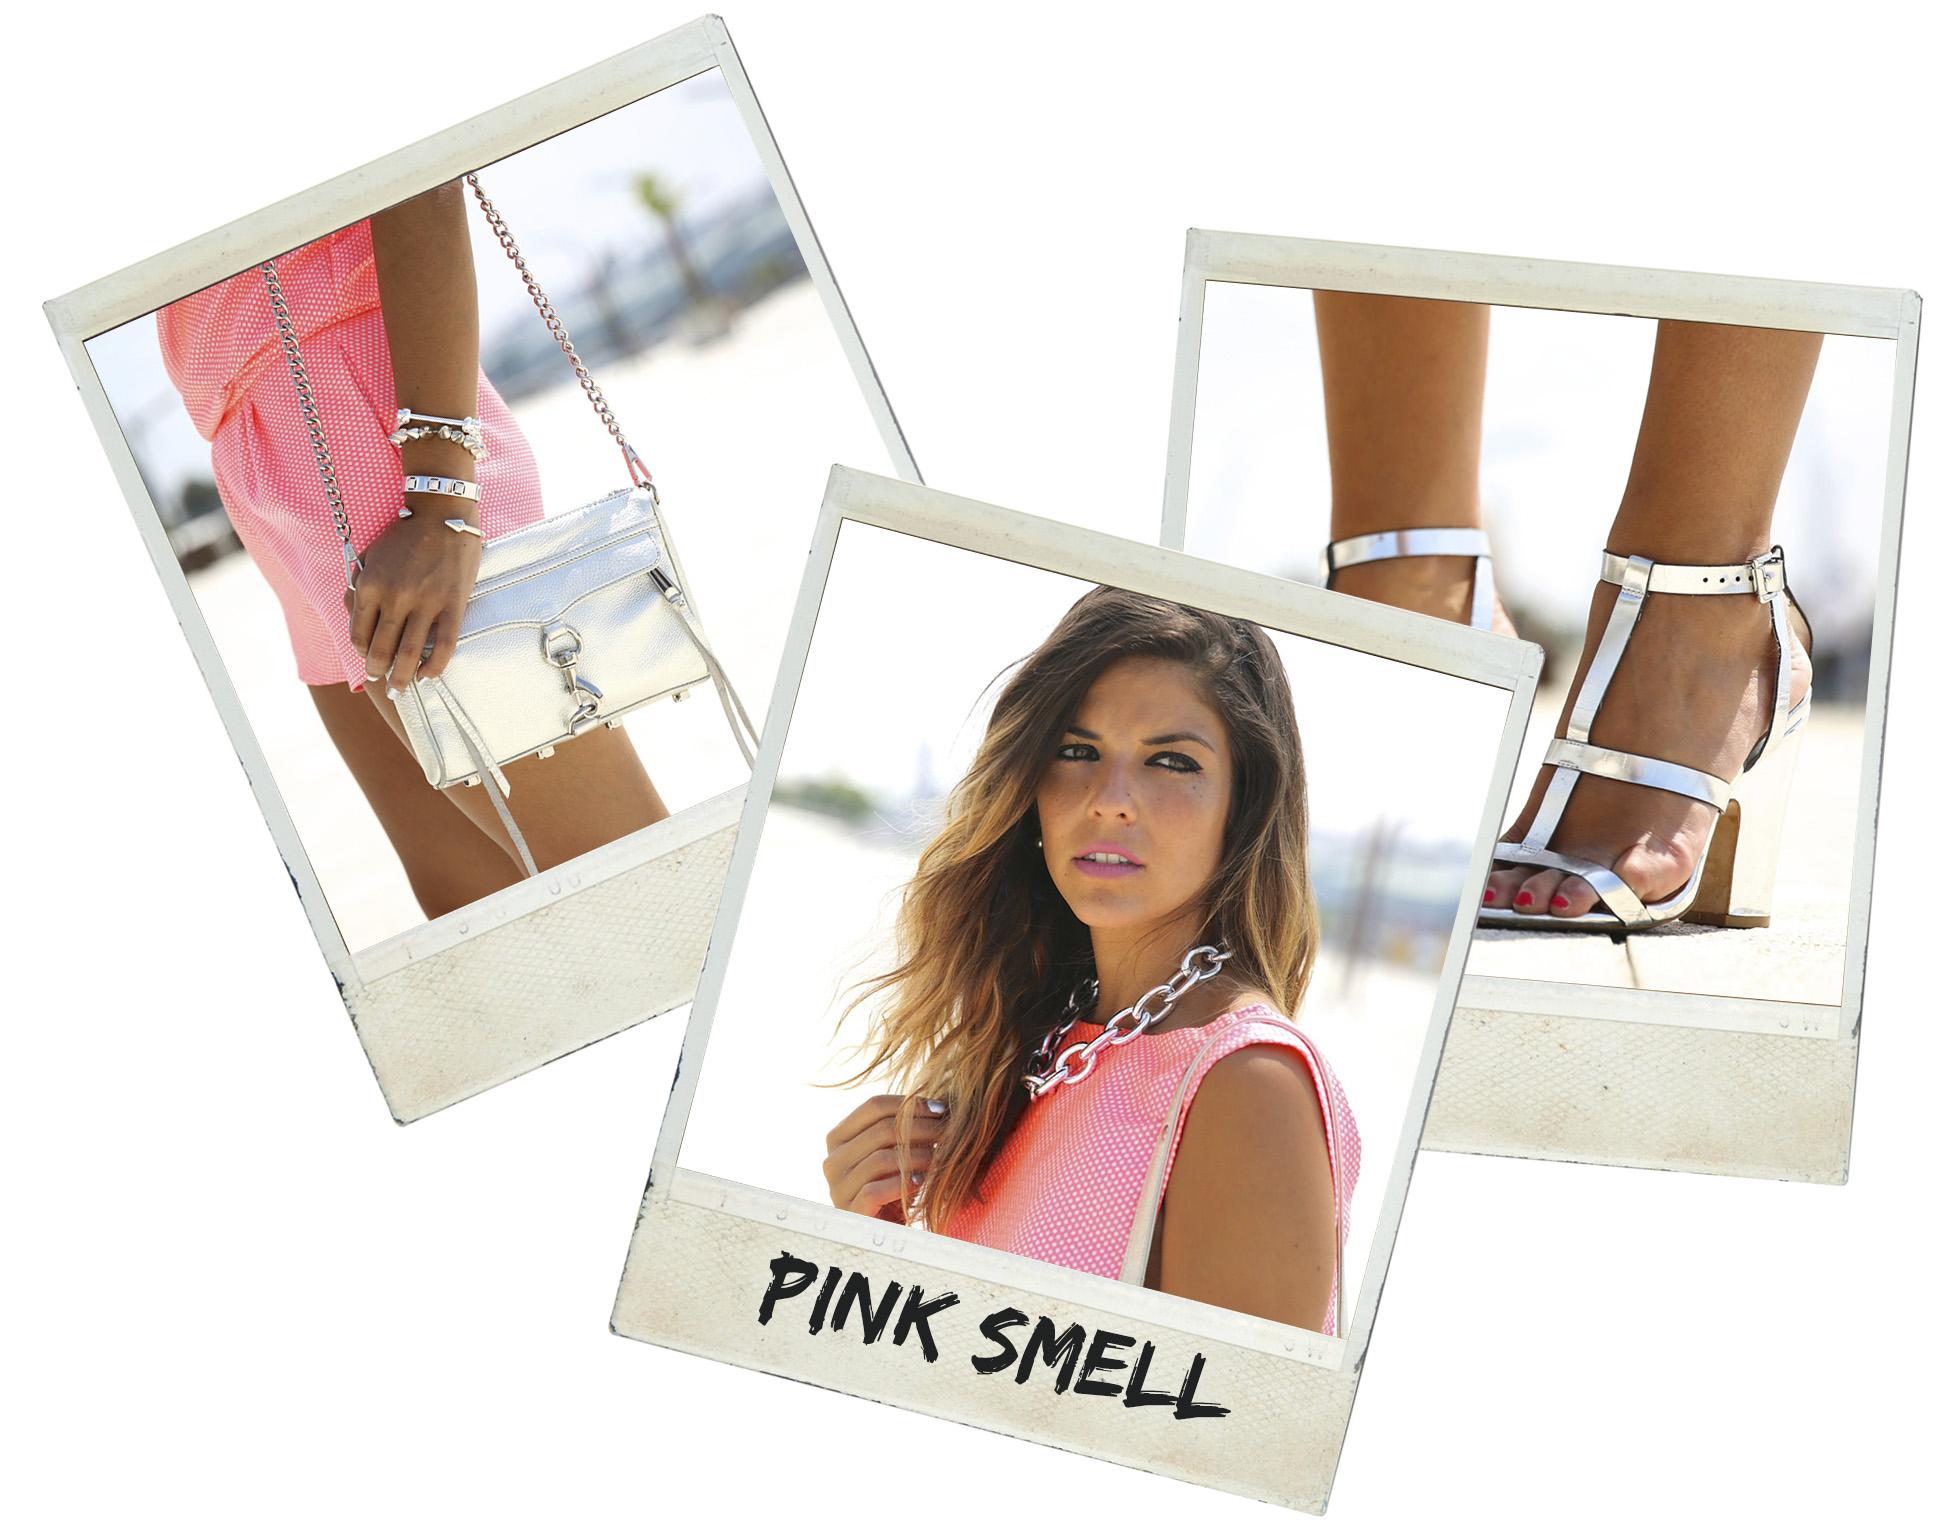 trendy_taste-look-outfit-street_style-ootd-blog-blogger-fashion_spain-moda_españa-silver_bag-bolso_plata-mono_rosa-mekdes-coruña-marina-polaroid